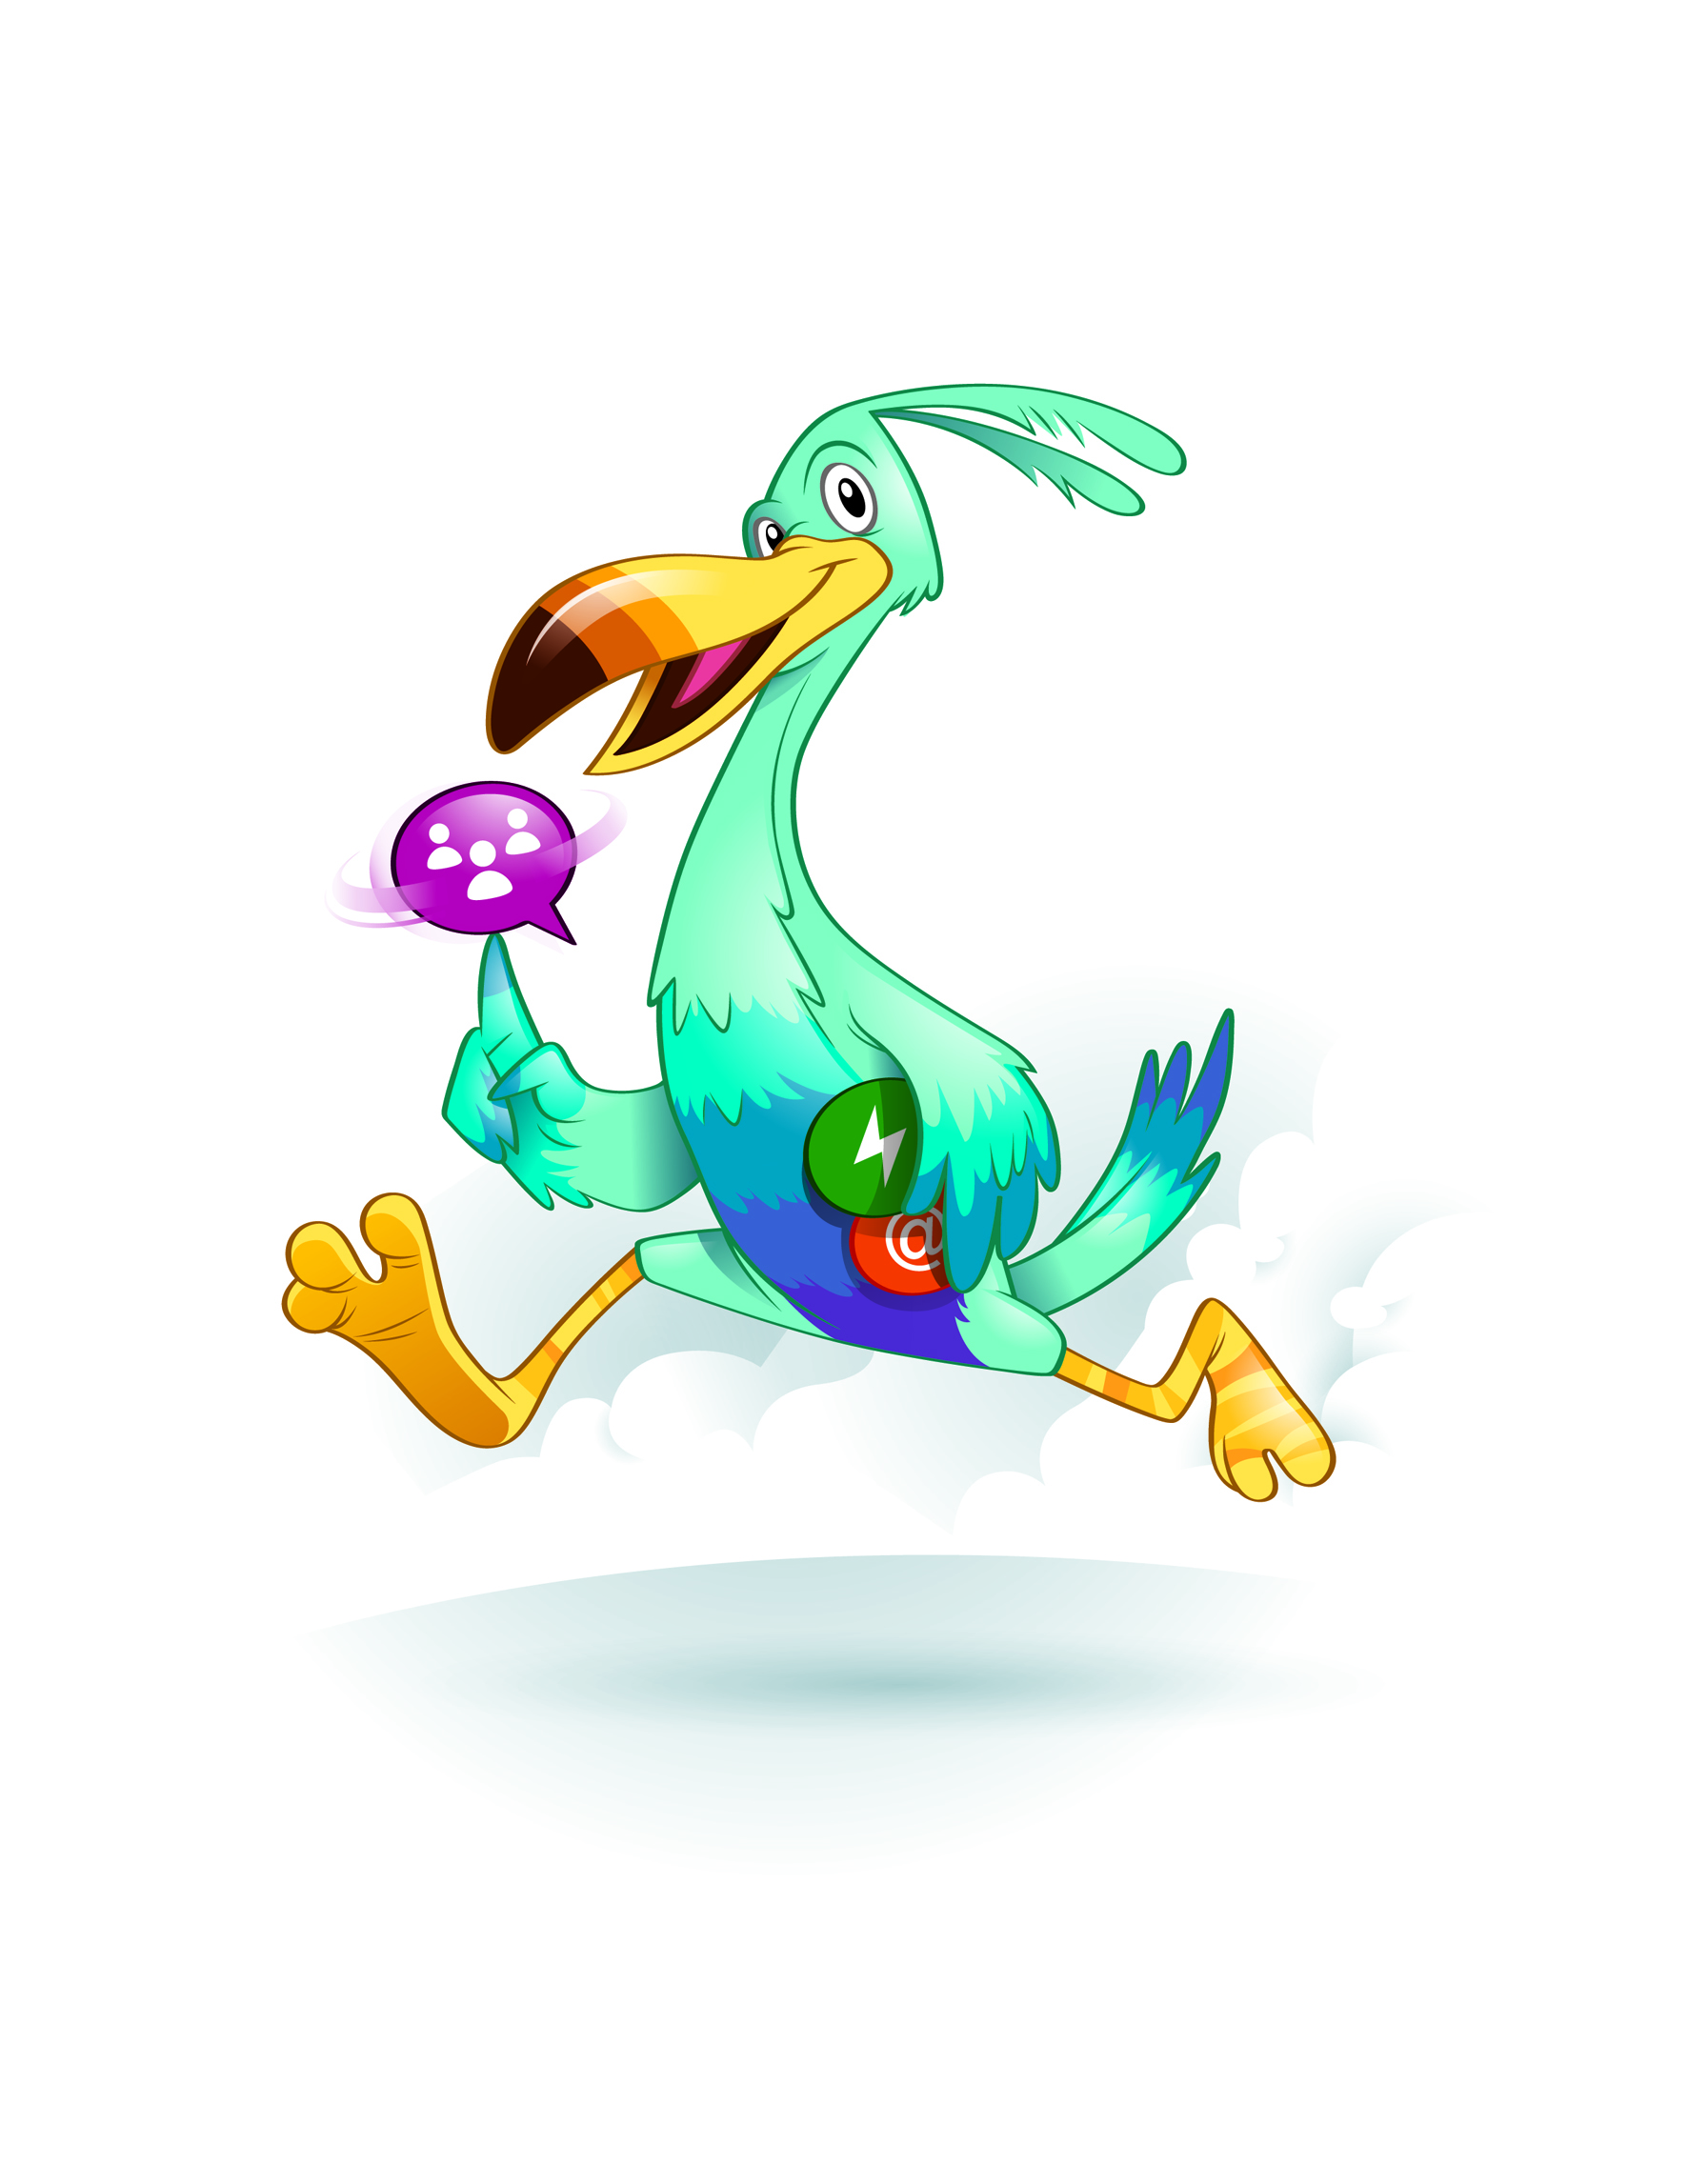 Fast Exotic Bird Mascot